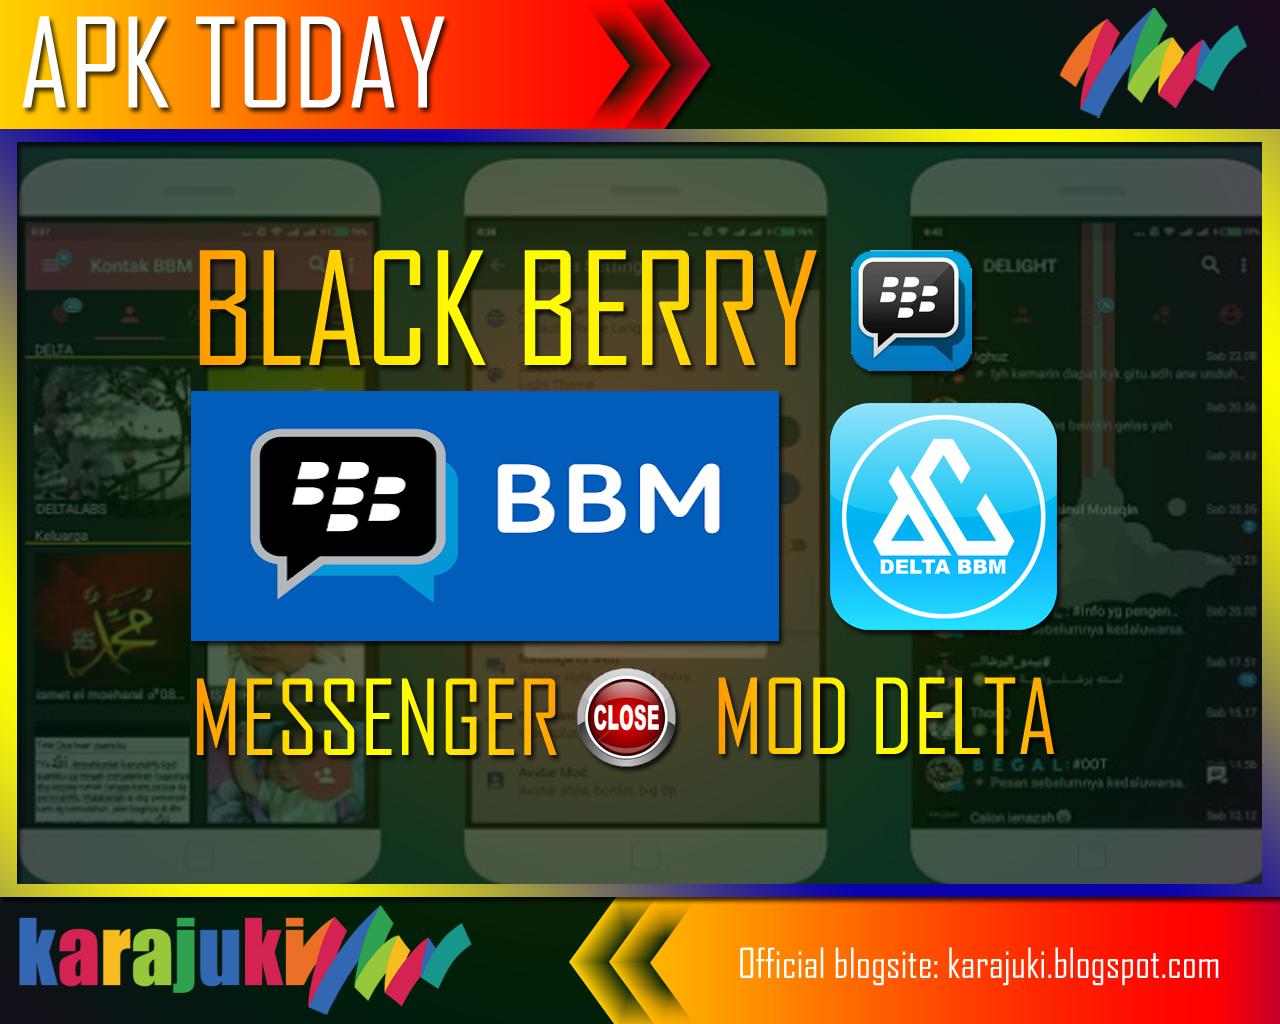 Download Bbm Mod Delta Download Apk For Android - KARAJUKI